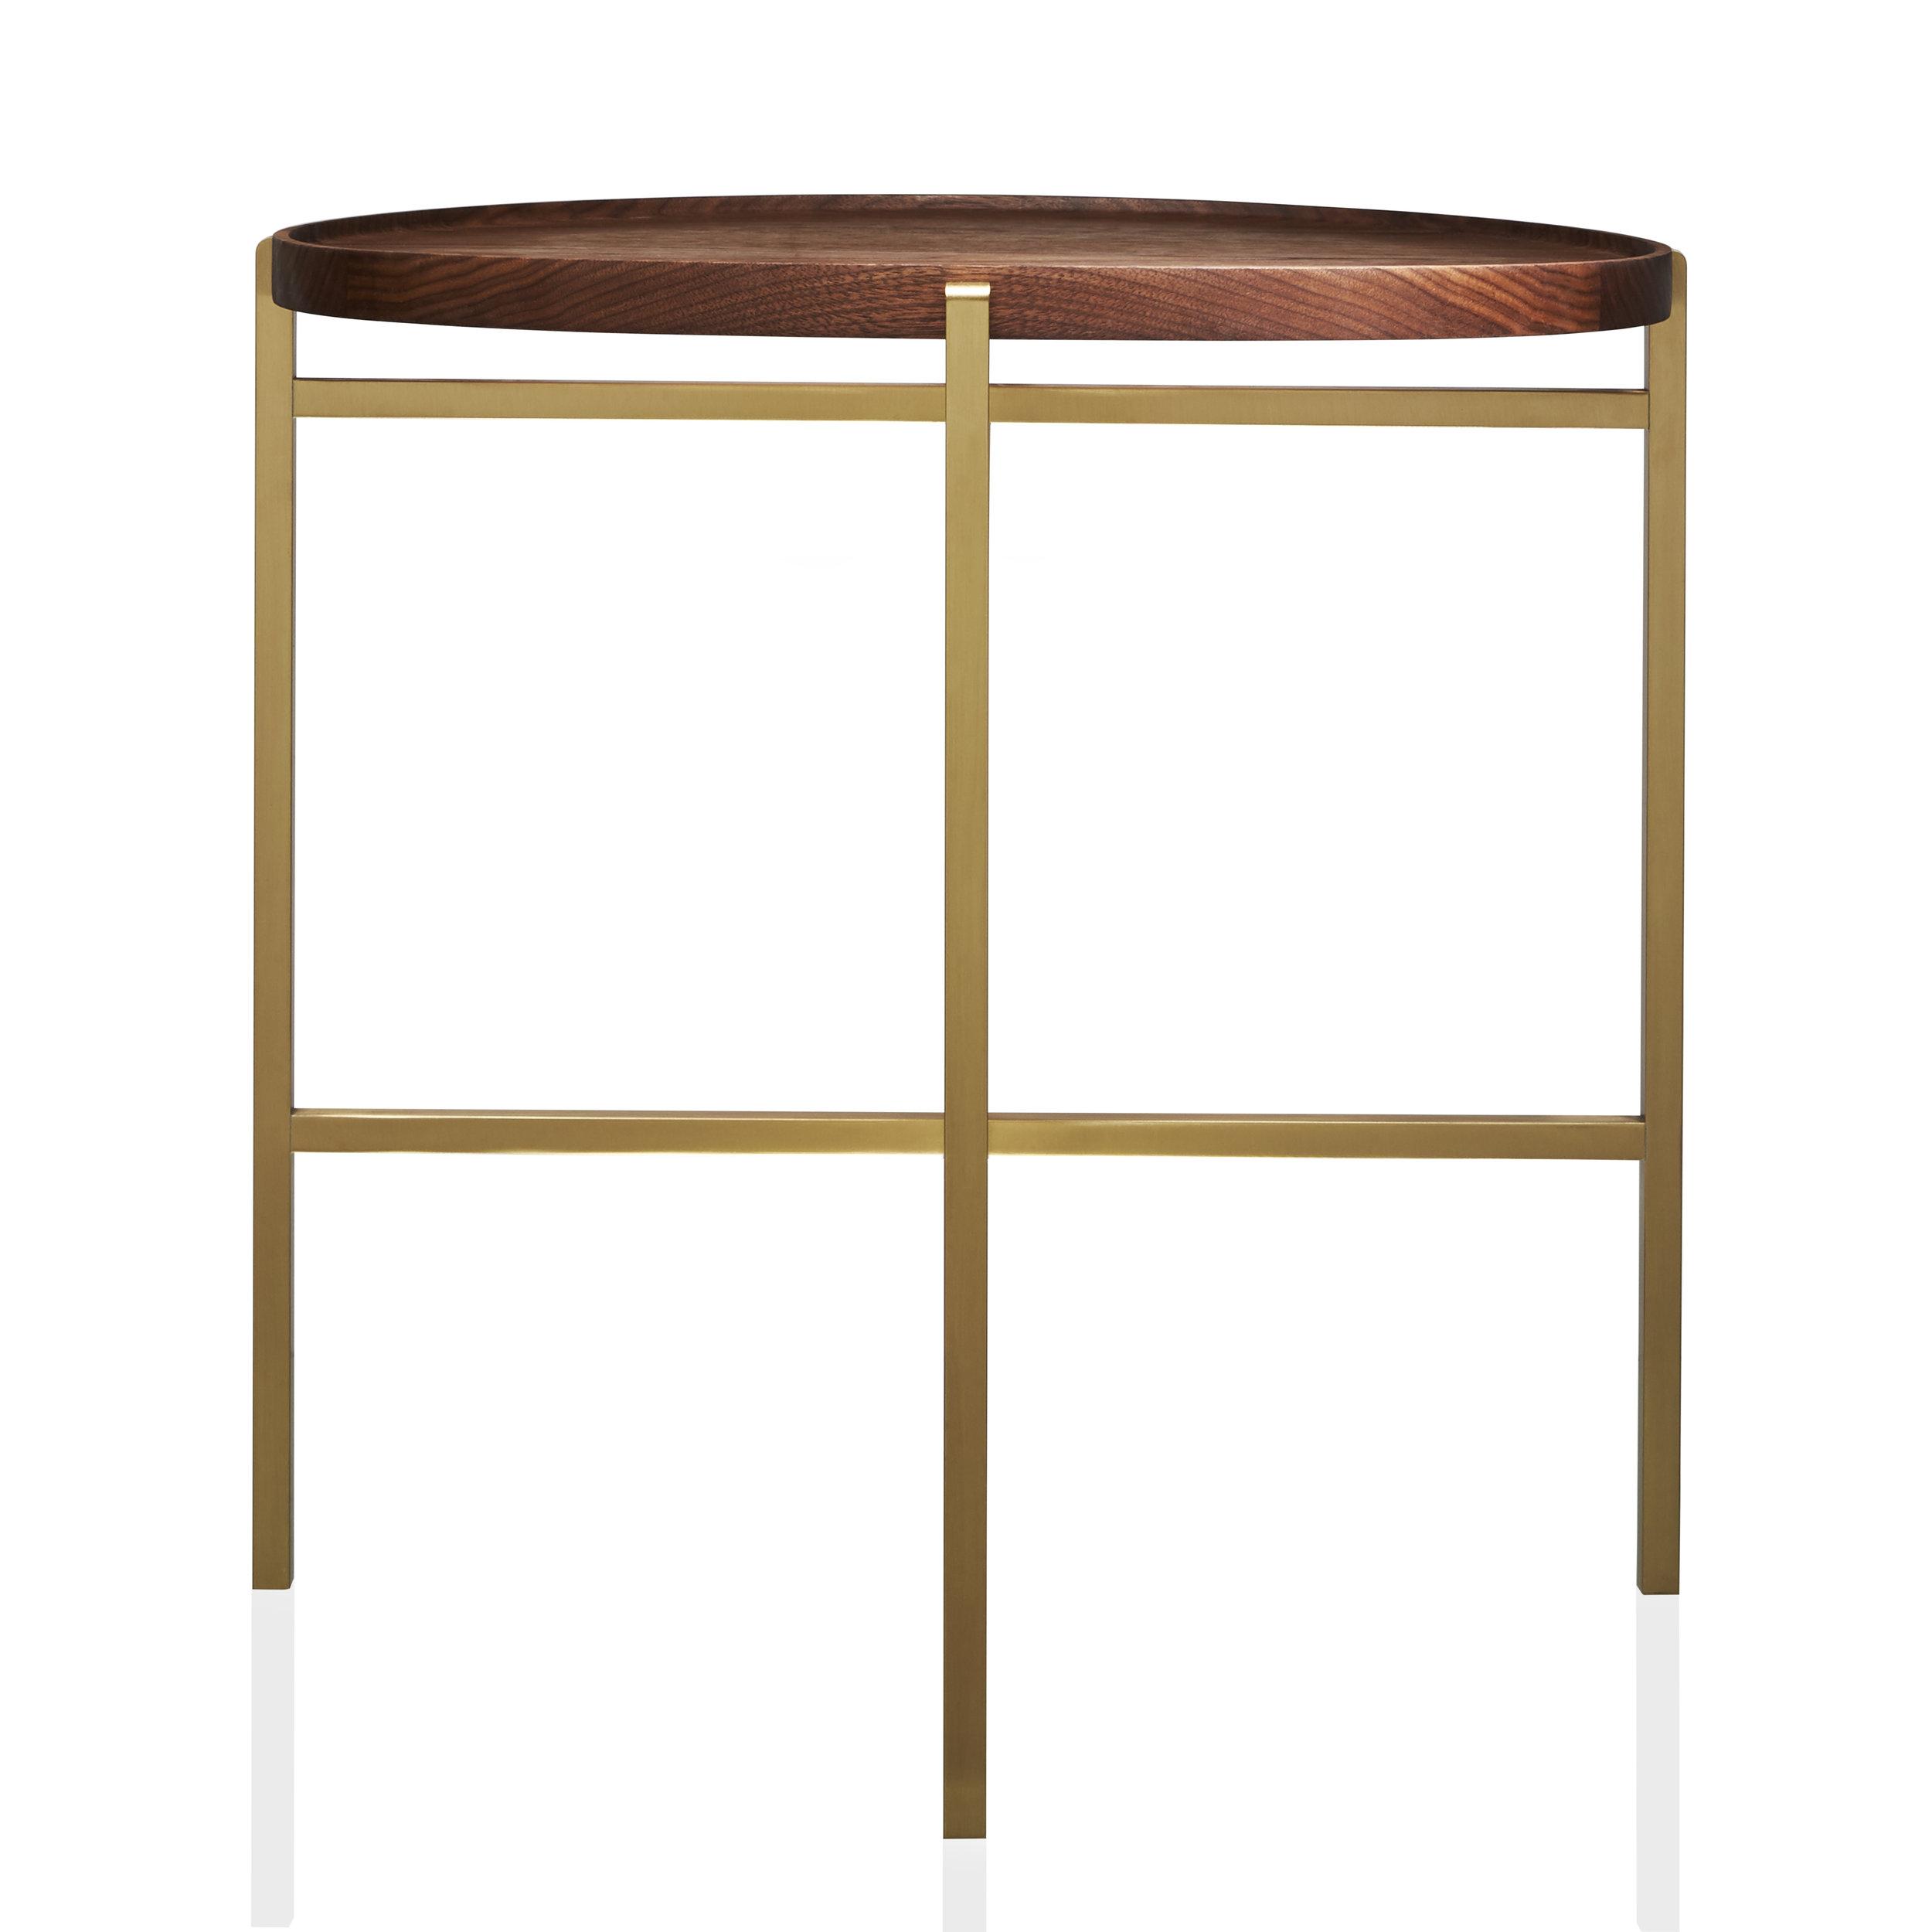 Table_Walnut-Wood_2.jpg